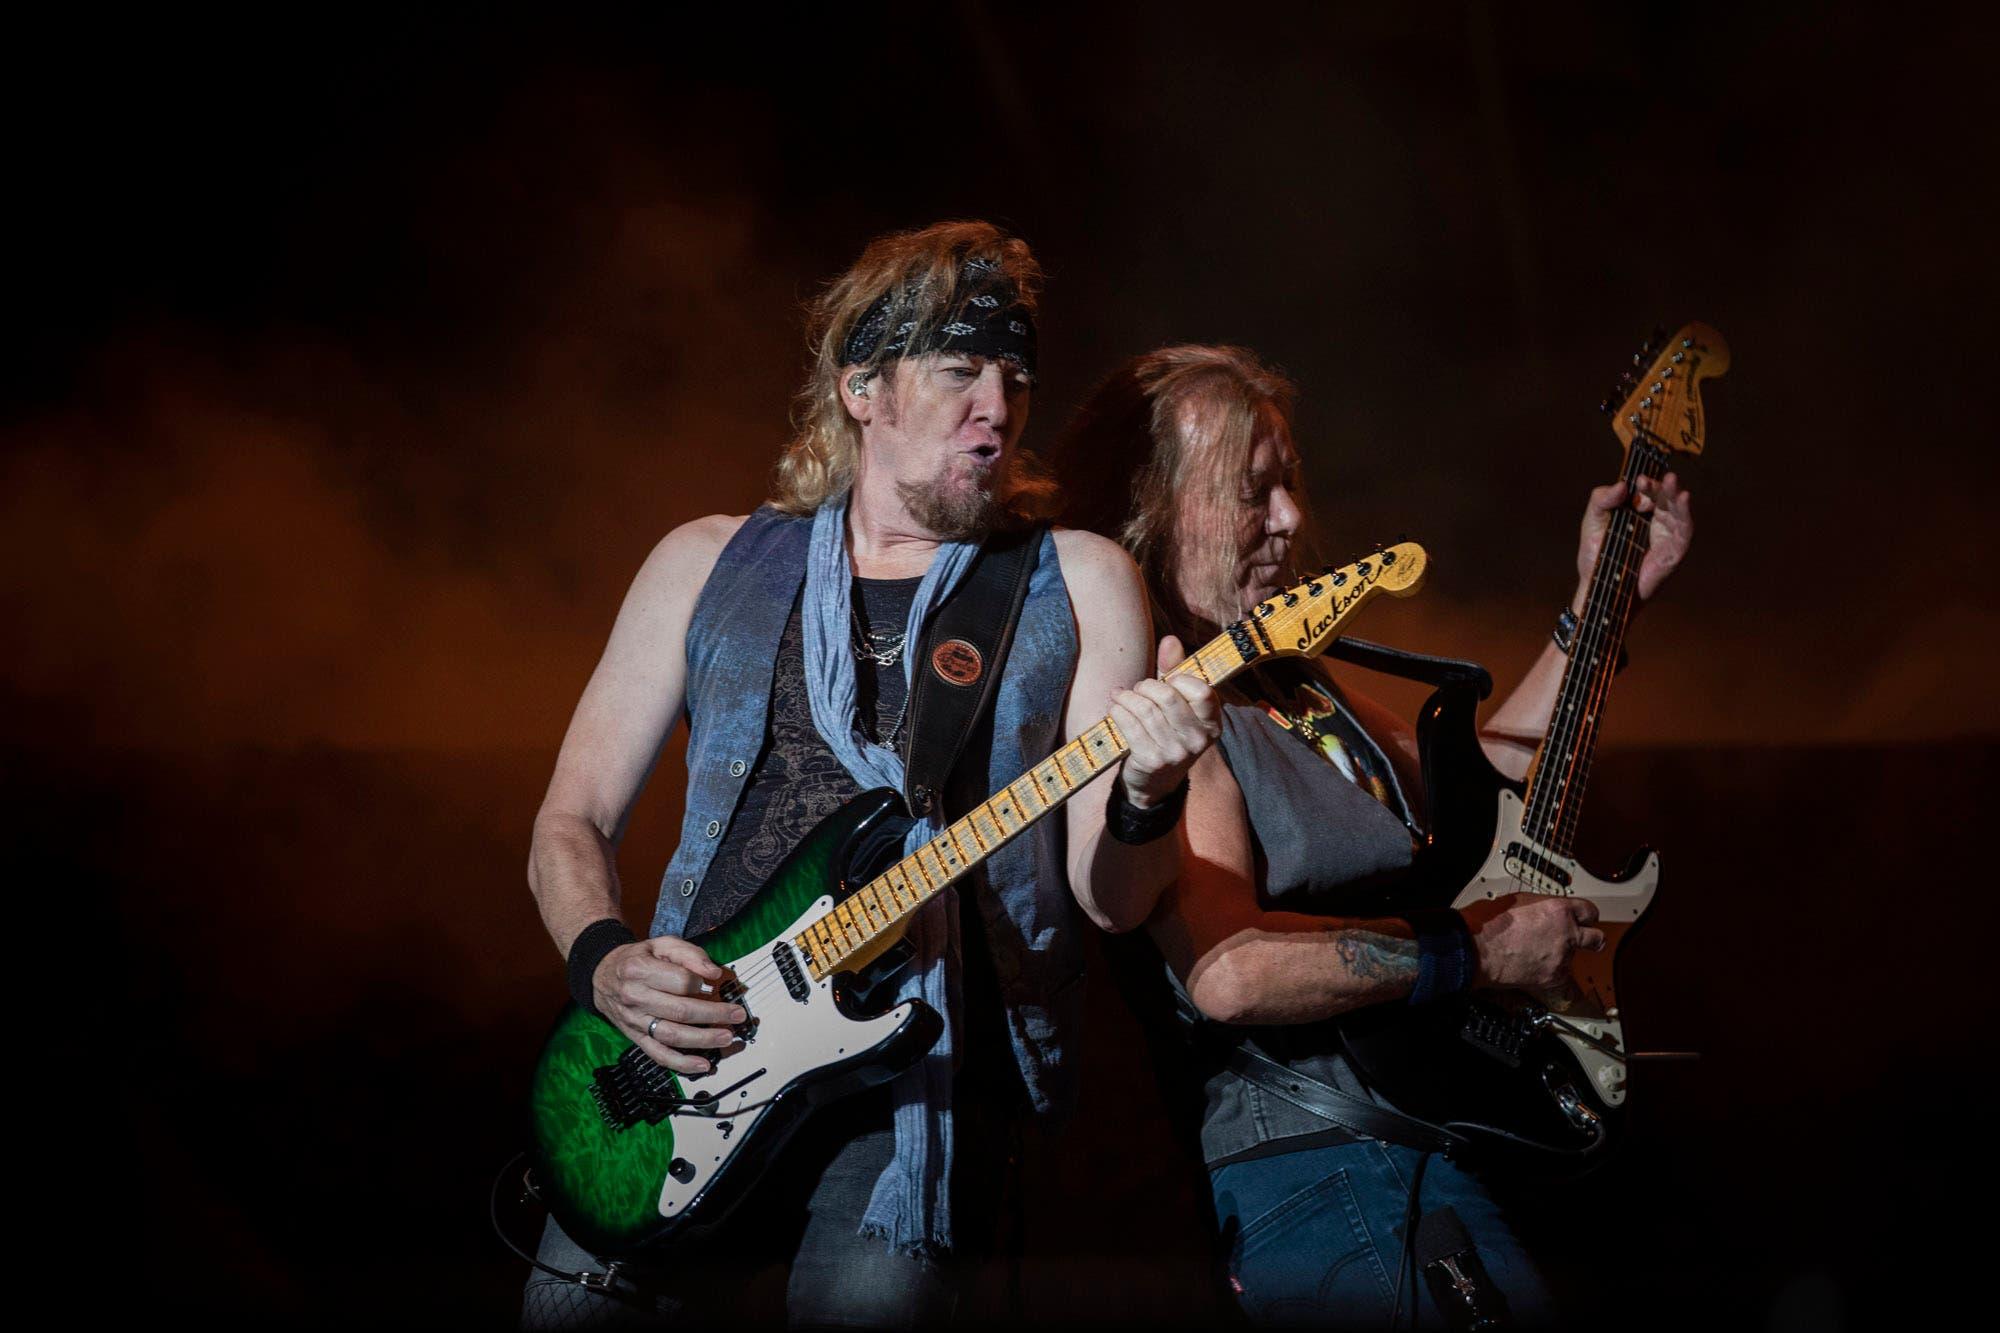 Iron Maiden desplegó sus clásicos en un show de impactante perfil teatral